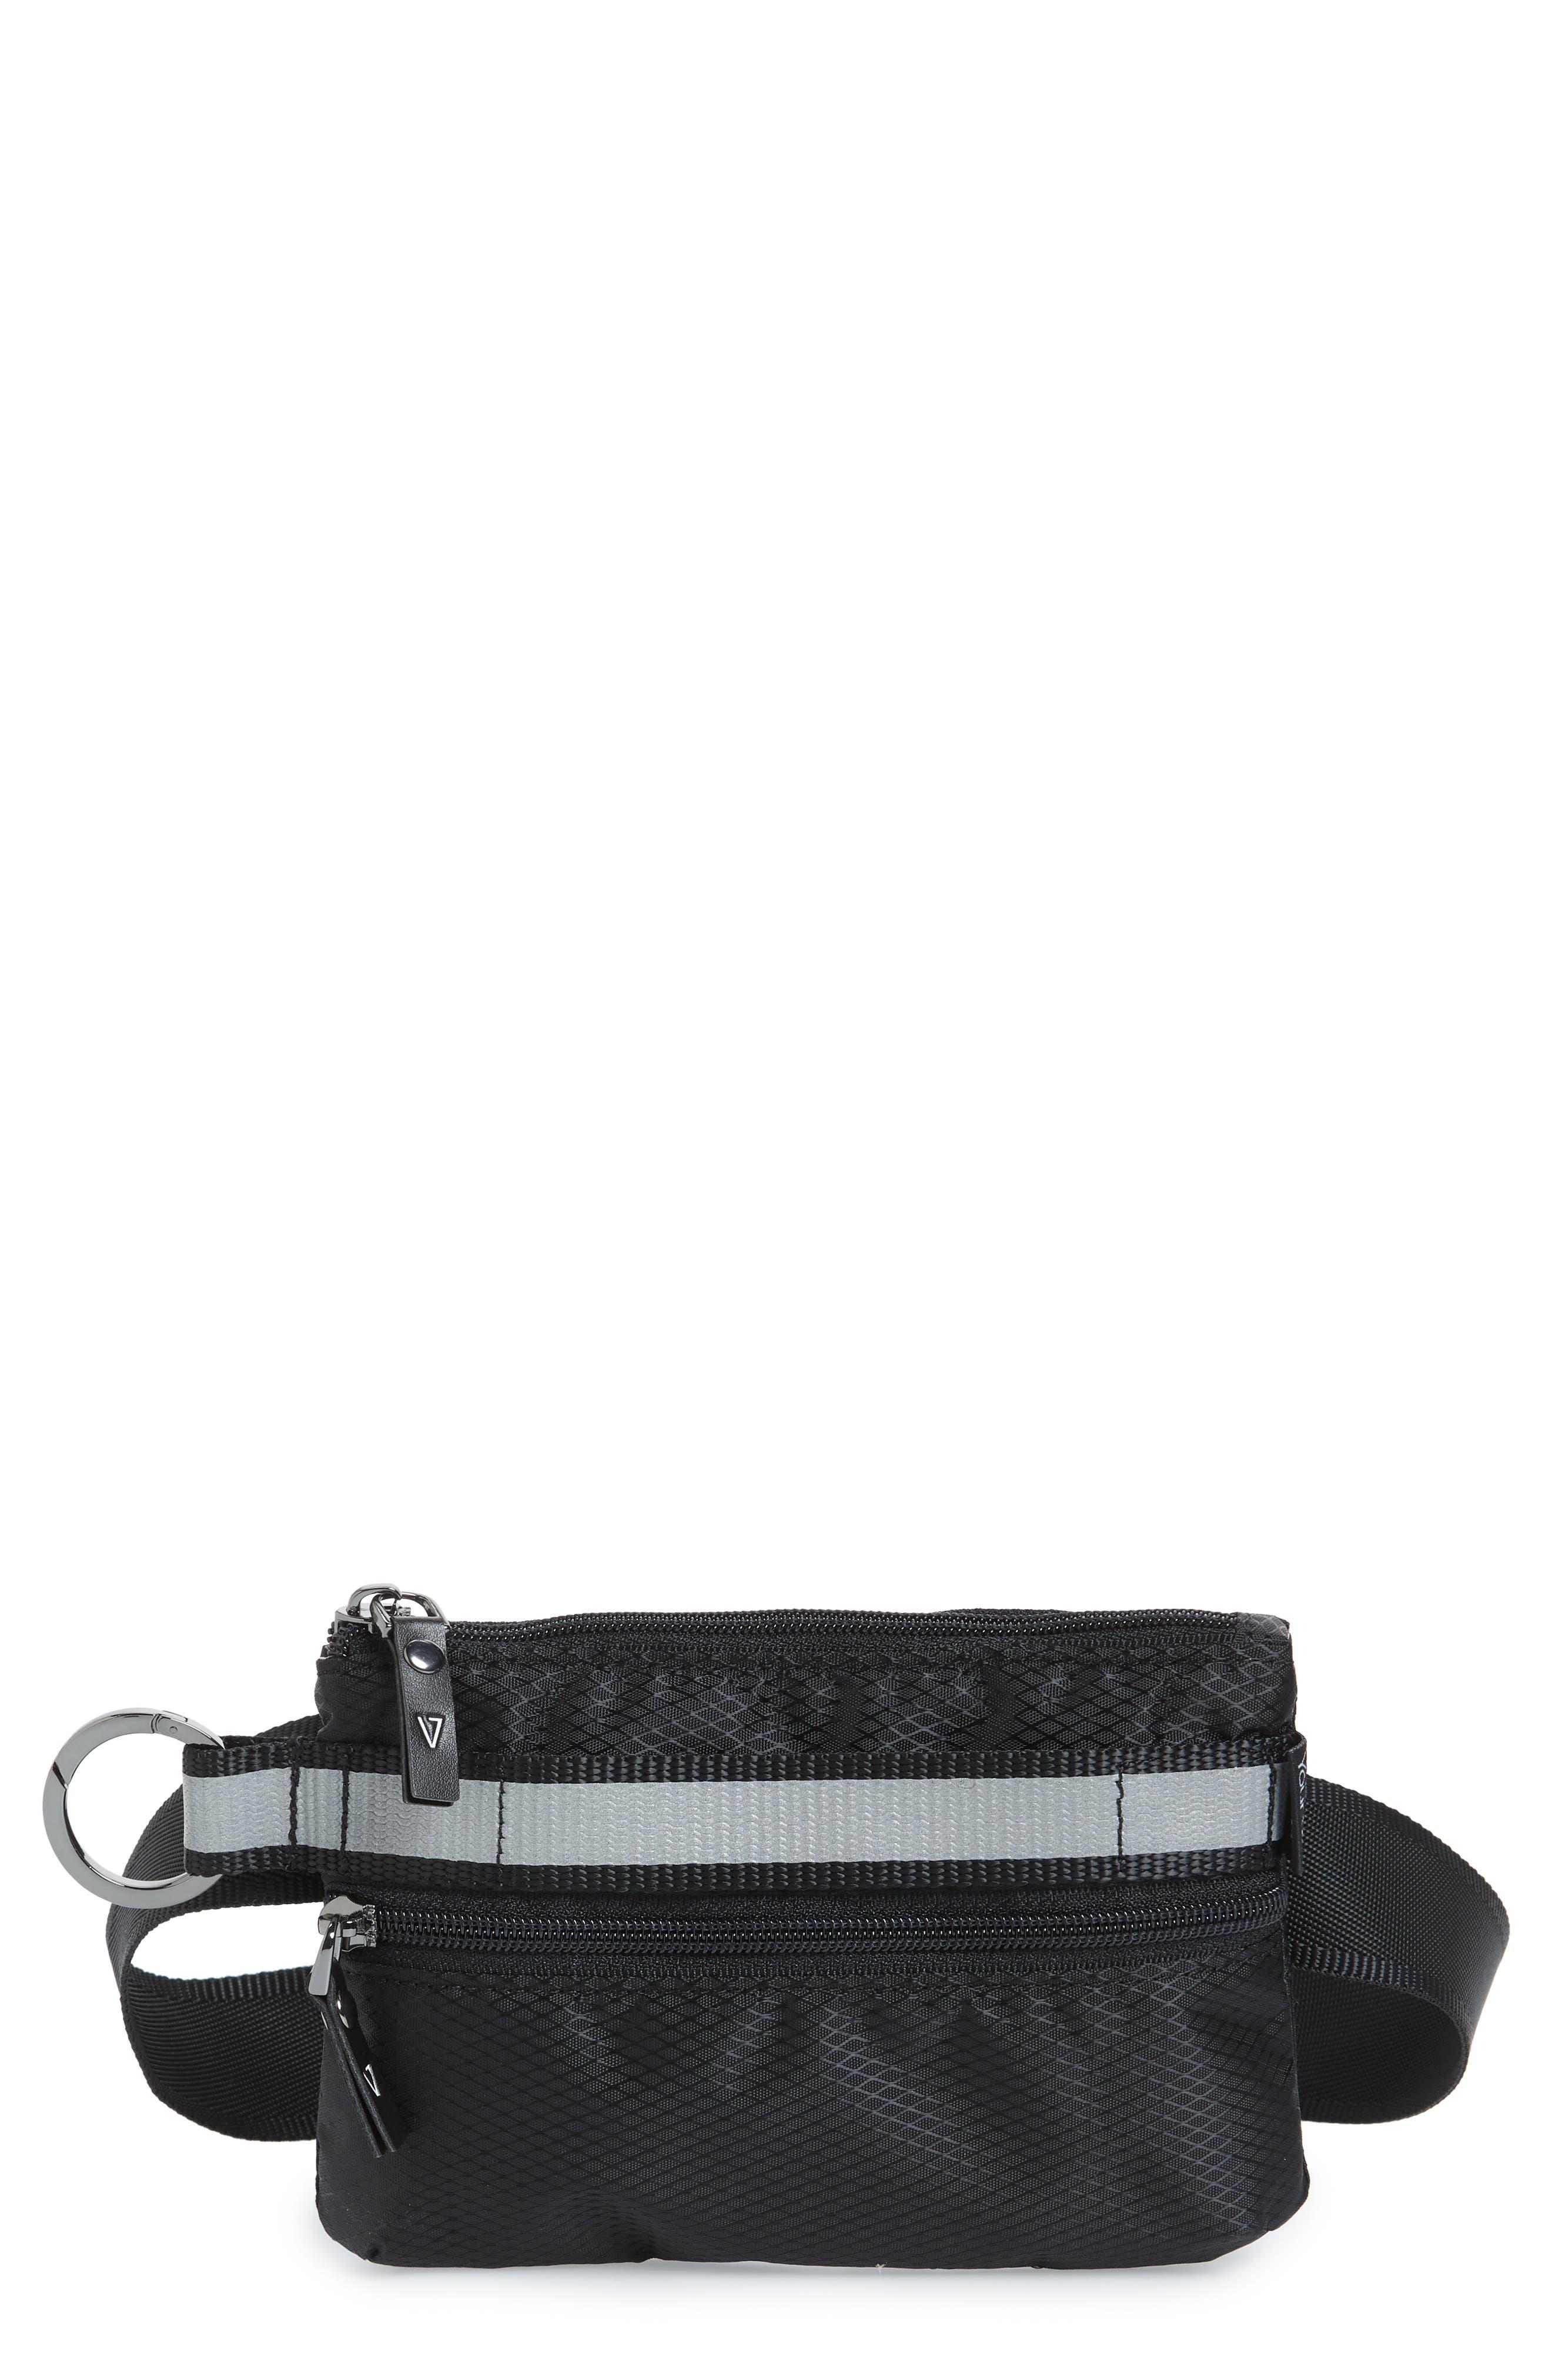 Urban Clutch Convertible Belt Bag,                             Main thumbnail 1, color,                             BLACK/ REFLECTIVE STRIPE